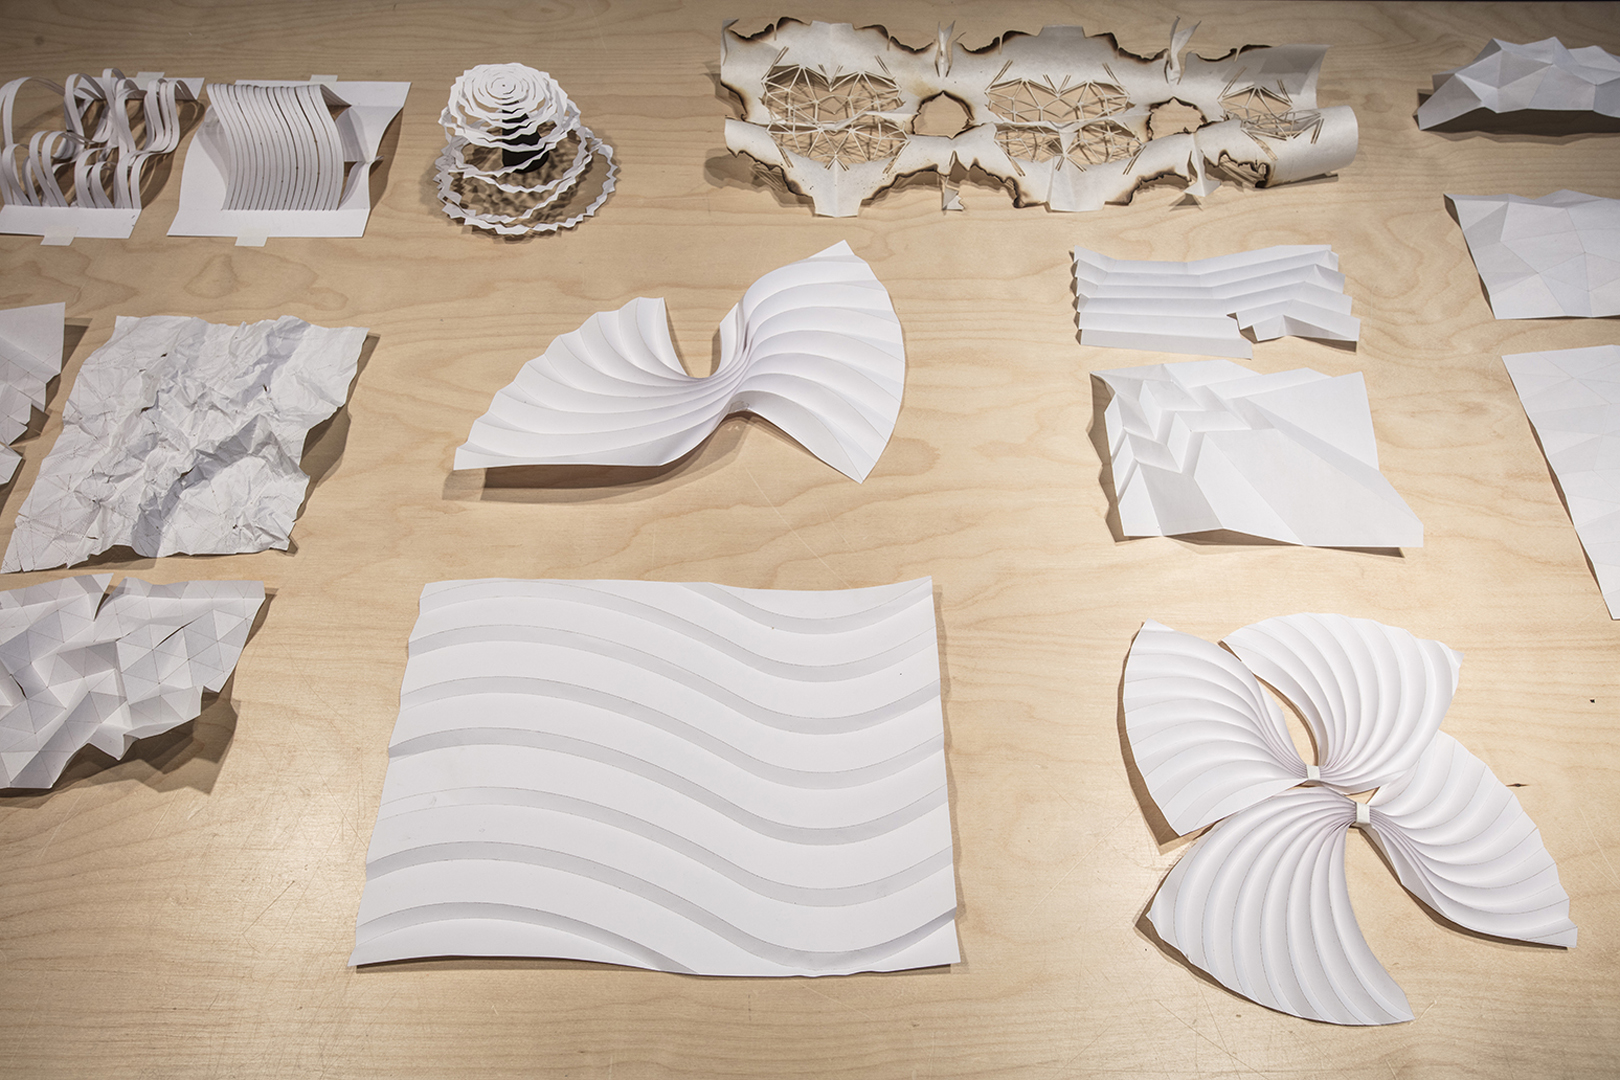 ©, Pavitra Wickramasinghe, Coral bones/La mer, Models for Meteors